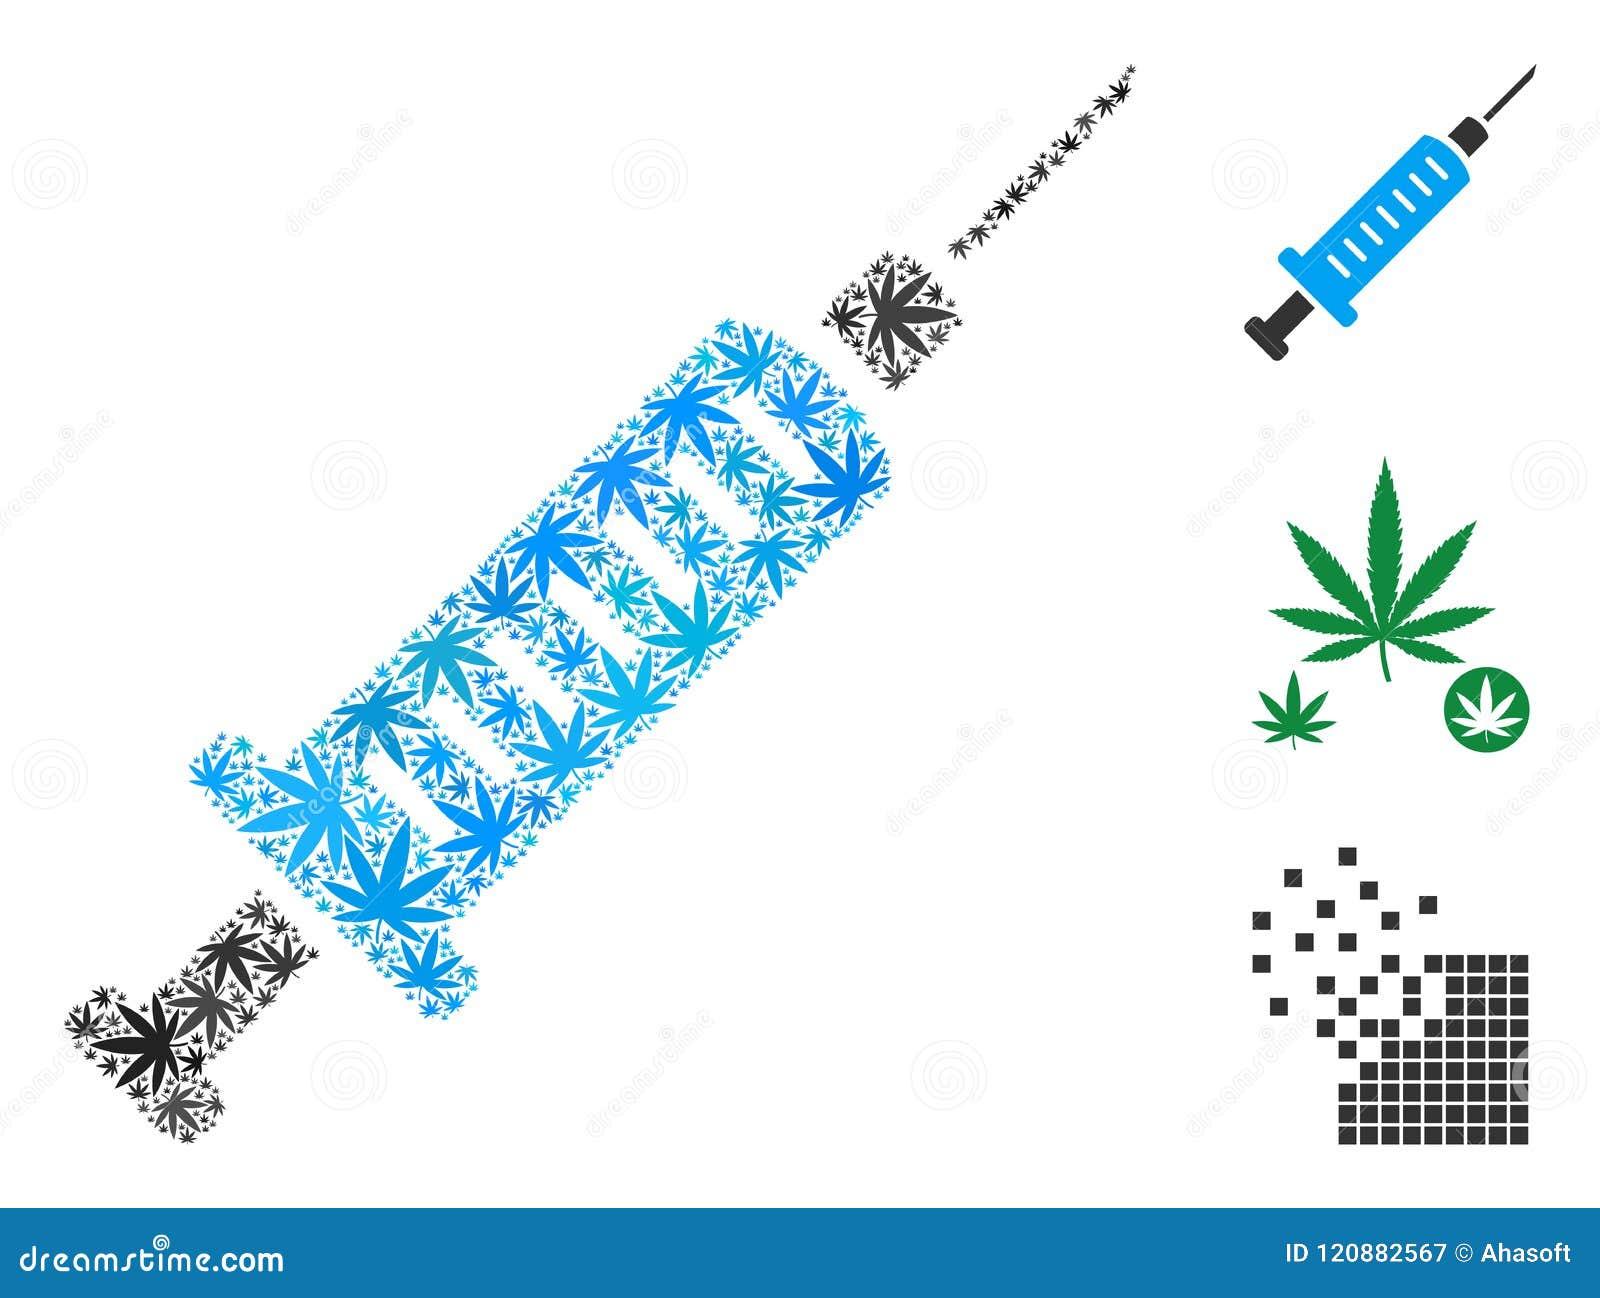 Syringe Composition Of Marijuana Stock Vector Illustration Of Icon